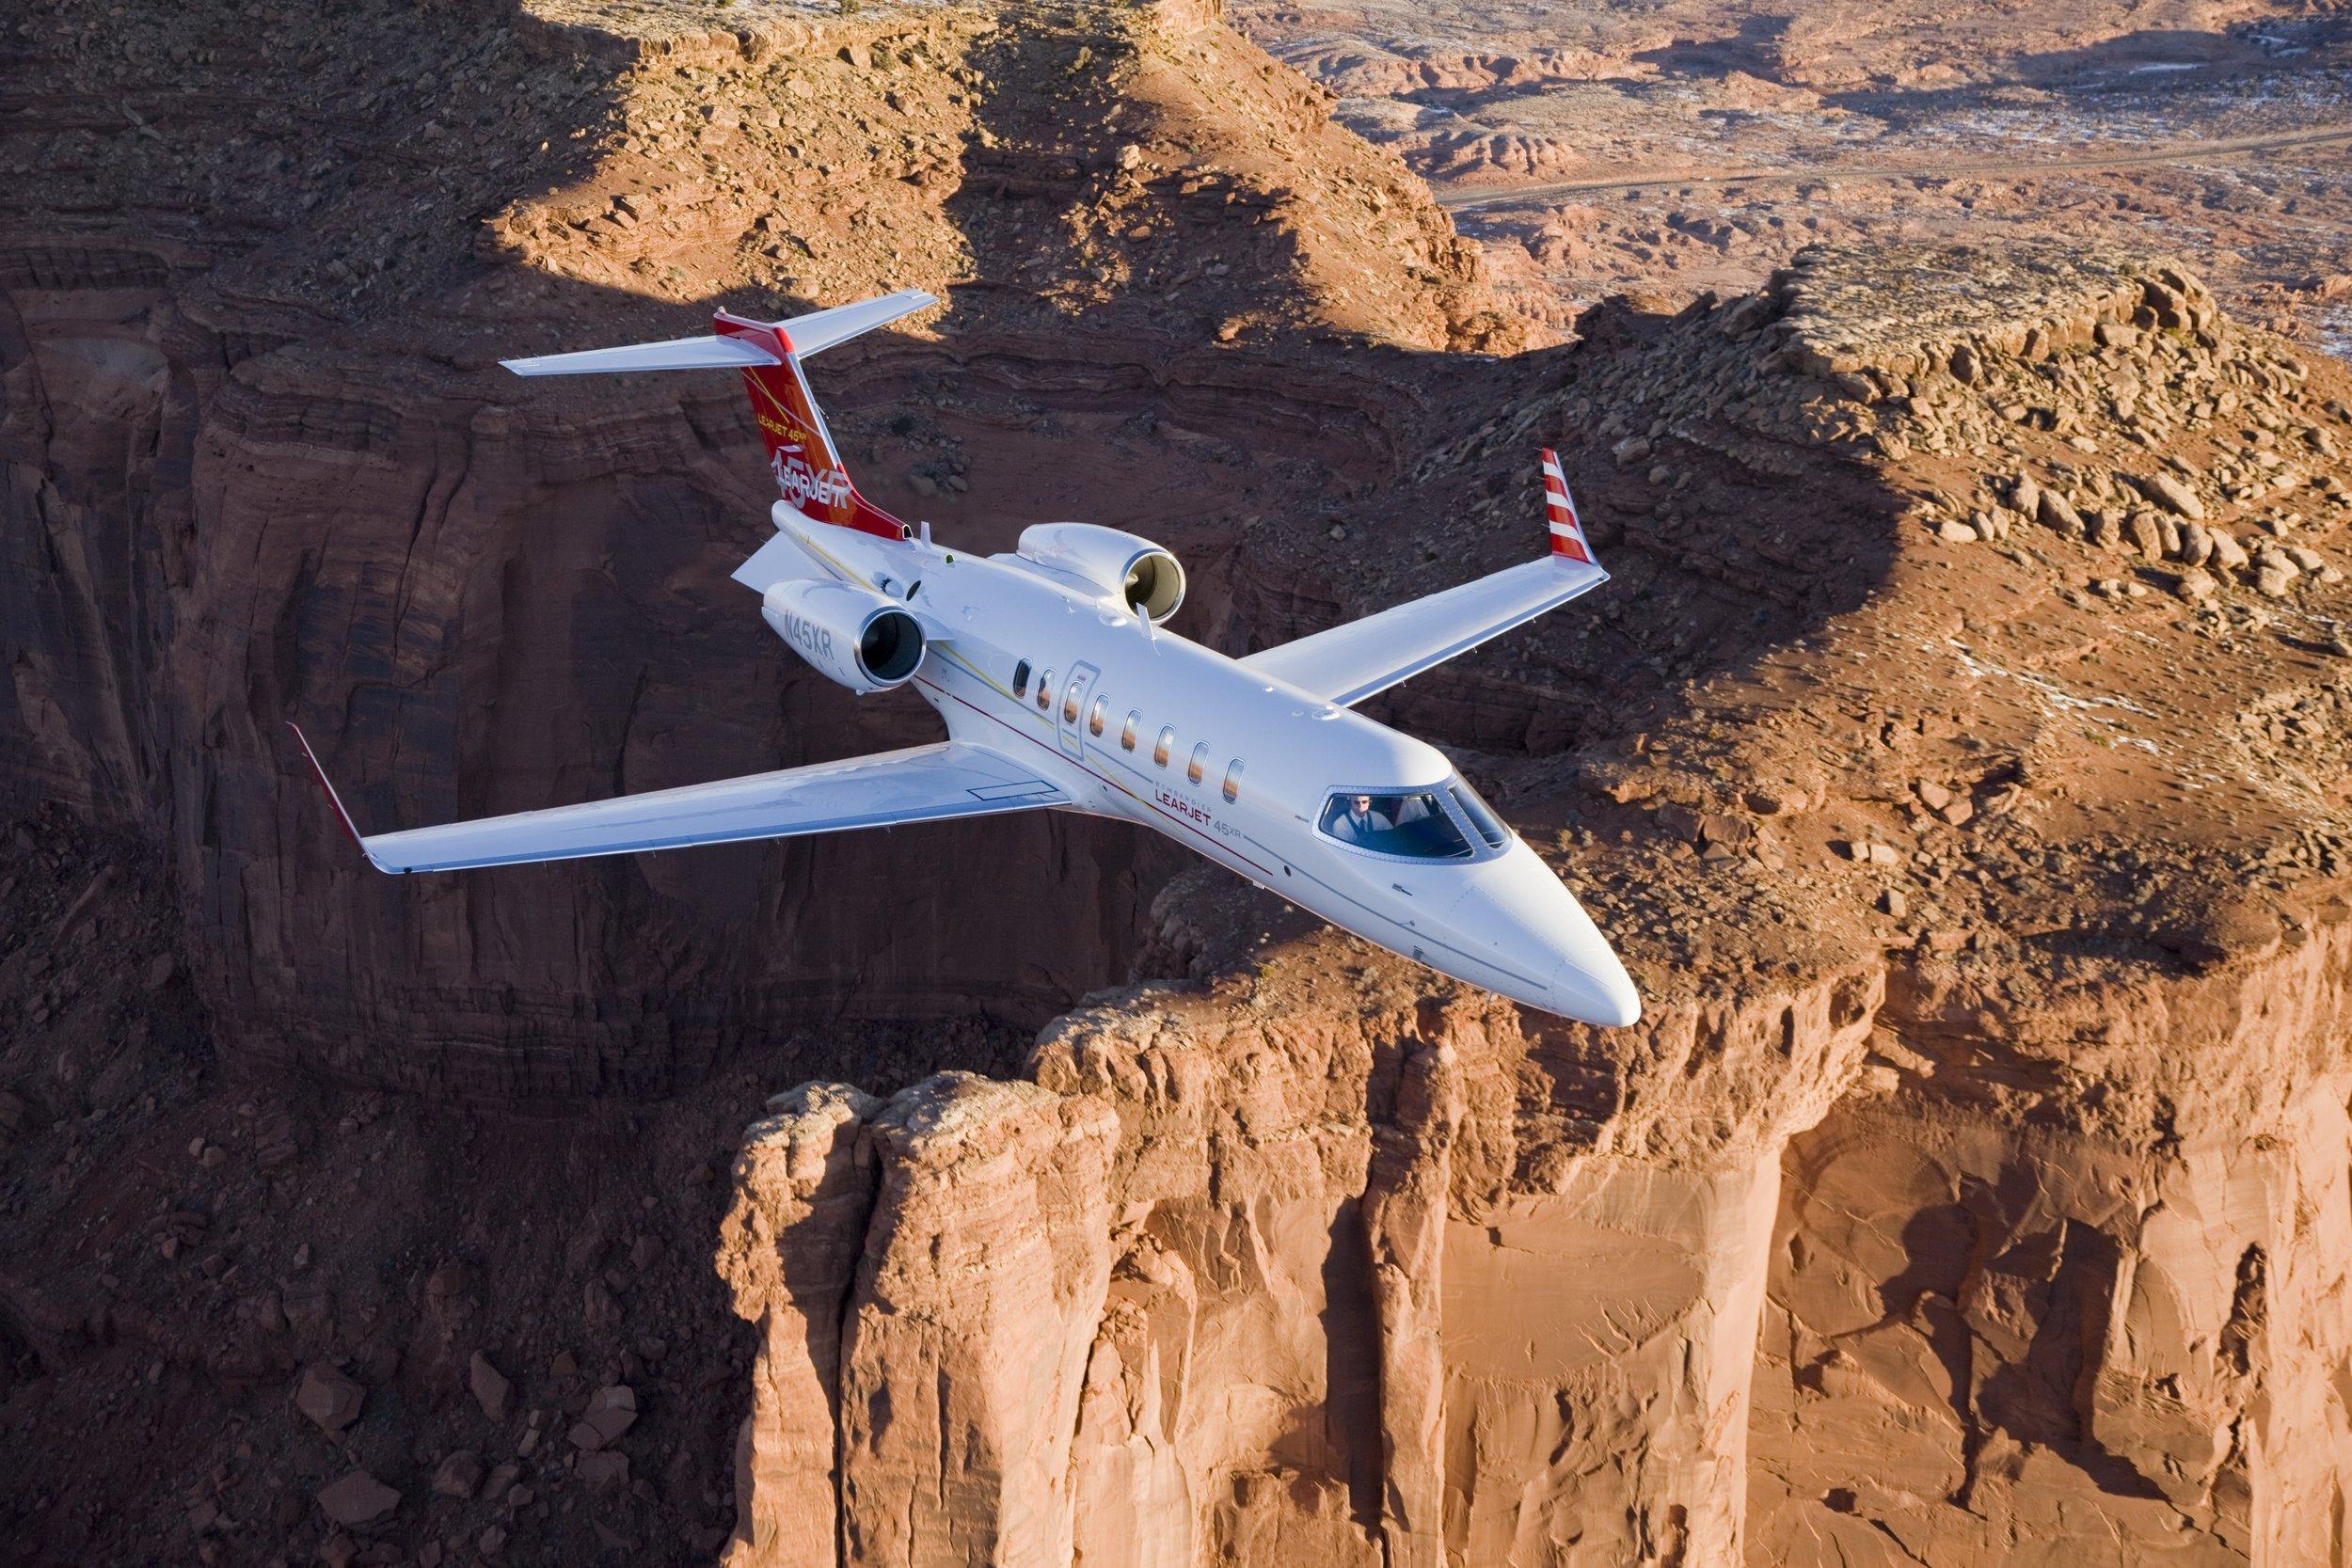 Learjet-45XR_Light-Jet_Legacy_Aviation_Private_Jet_NetJets_Jet_Charter_TEB_VNY_MIA_PBI_FRG_SFO_FLL_FXE_BED.jpg